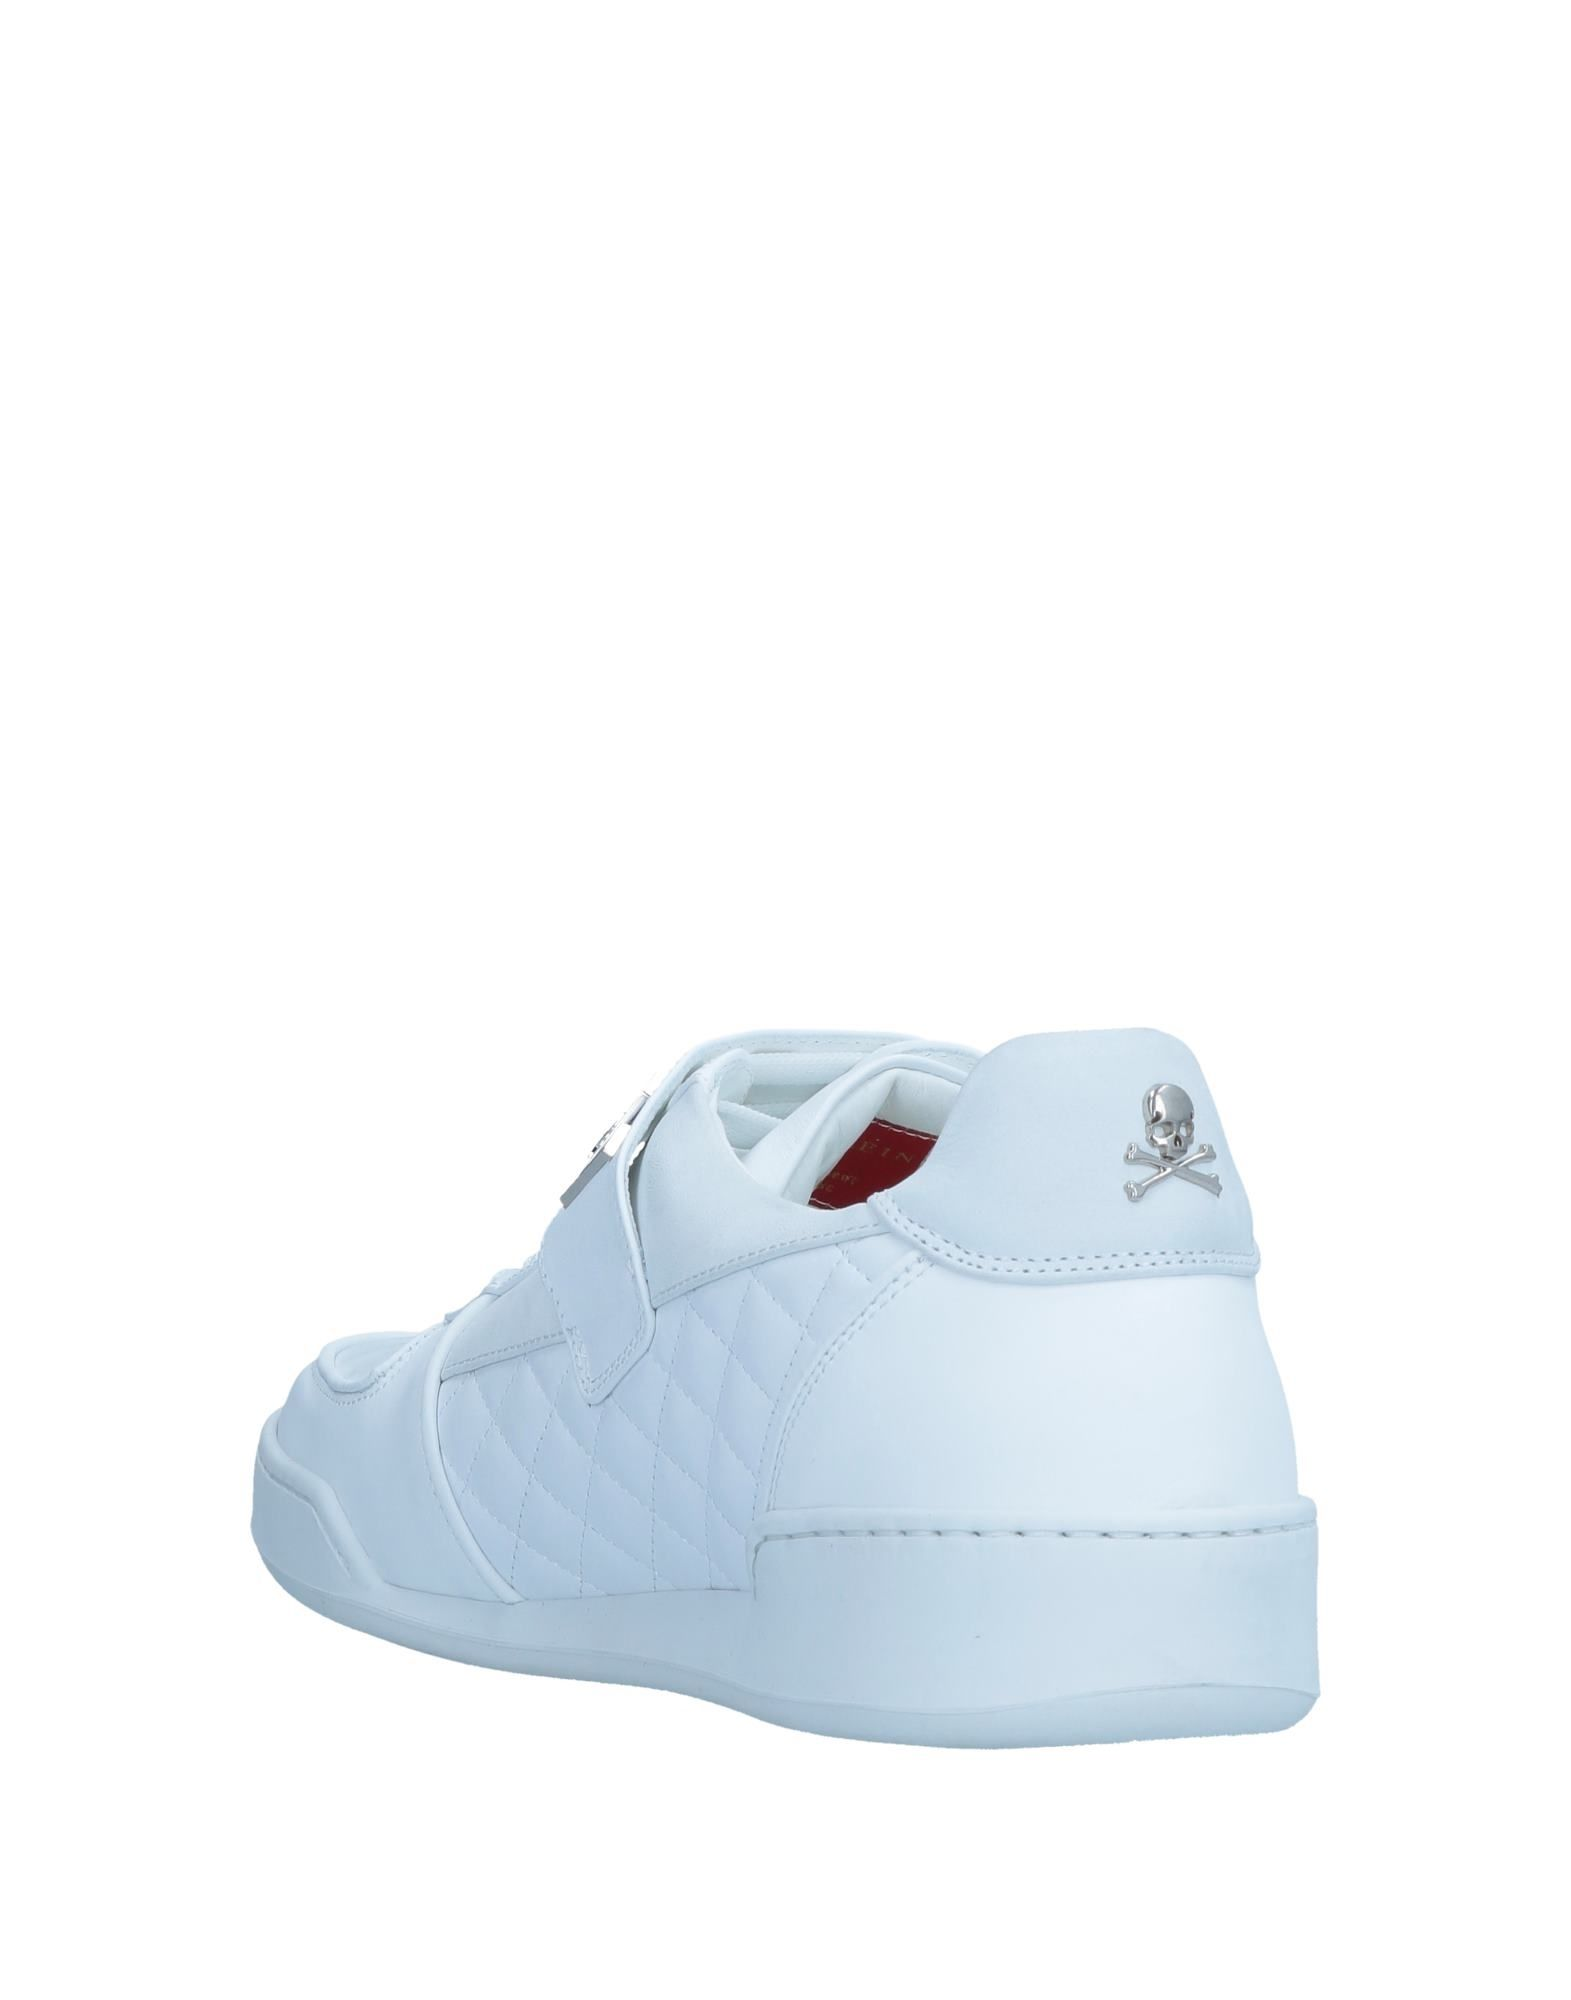 Philipp Plein Sneakers Herren  Schuhe 11511414LS Gute Qualität beliebte Schuhe  03b5a0